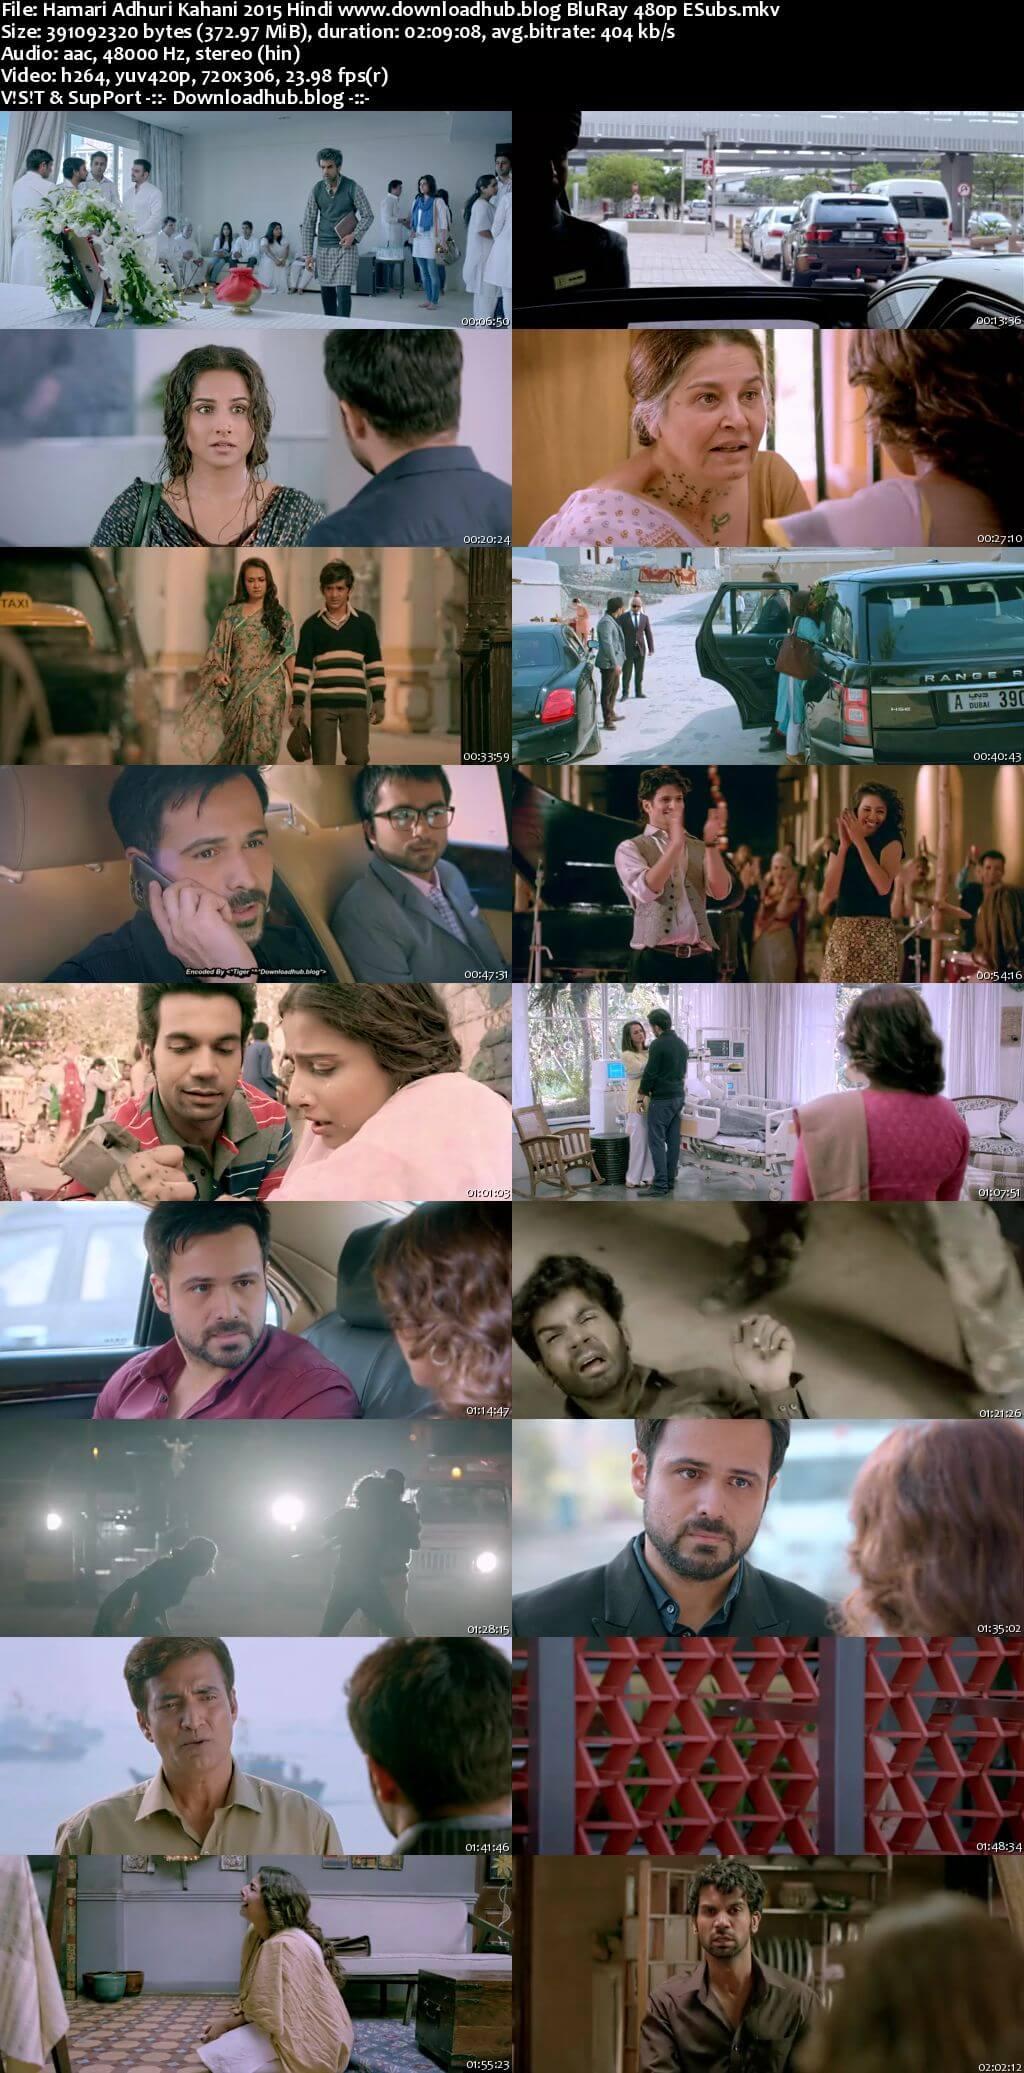 Hamari Adhuri Kahani 2015 Hindi 350MB BluRay 480p ESubs